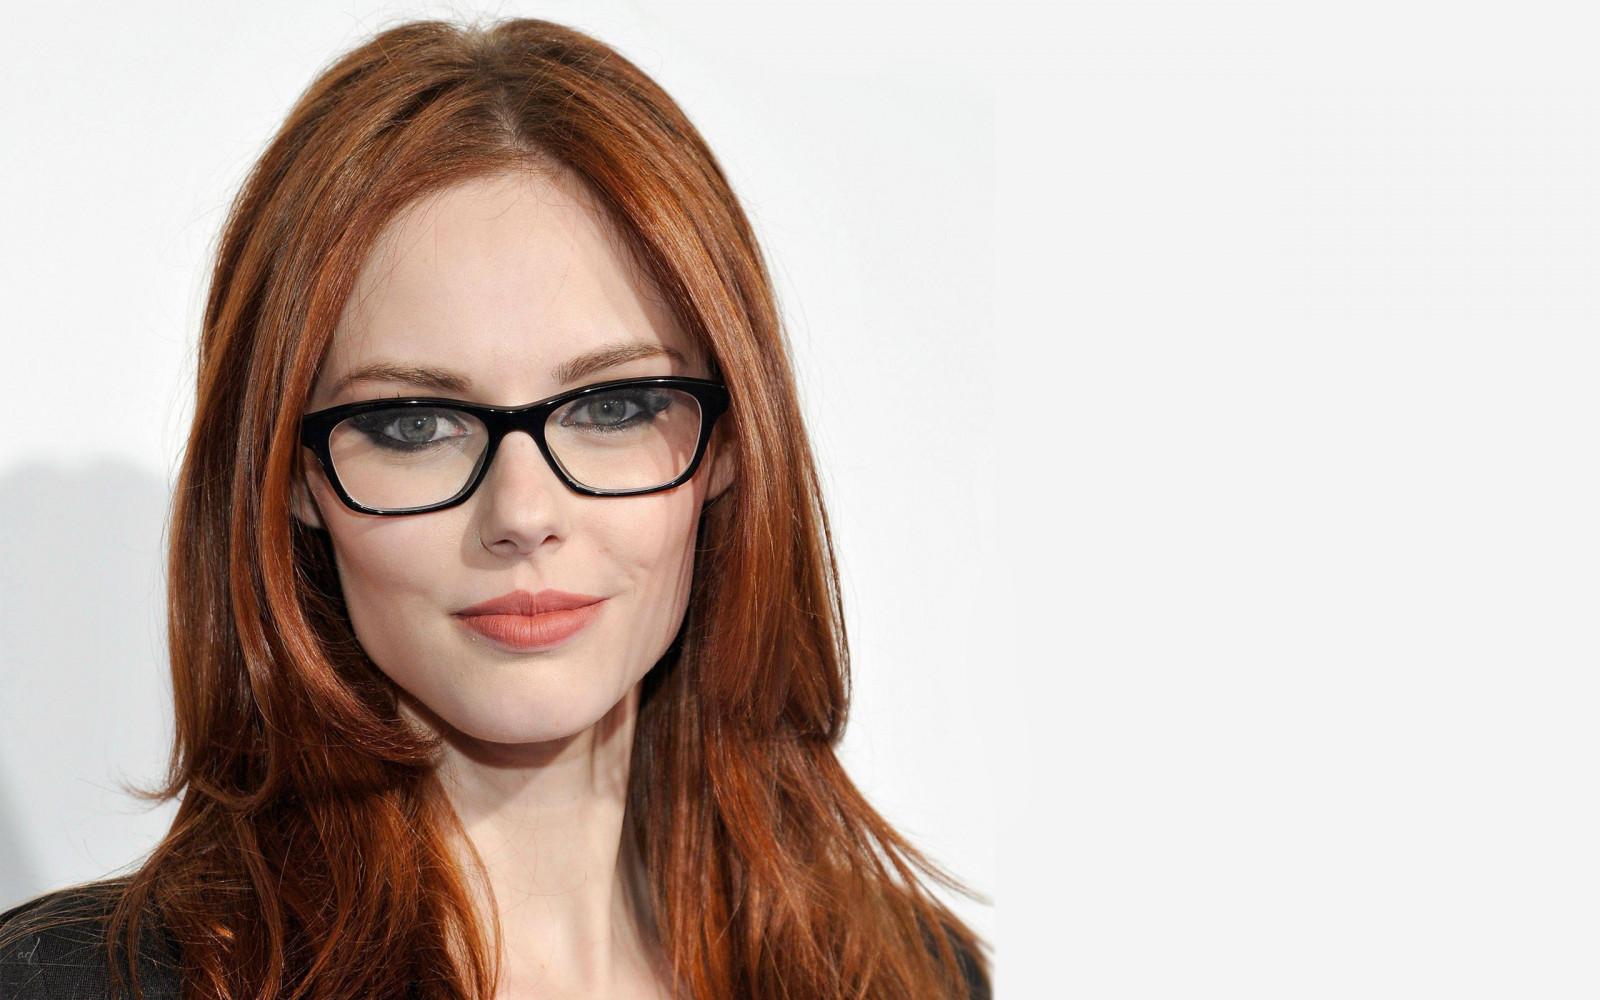 Wallpaper : Face, Women, Redhead, Model, Simple Background